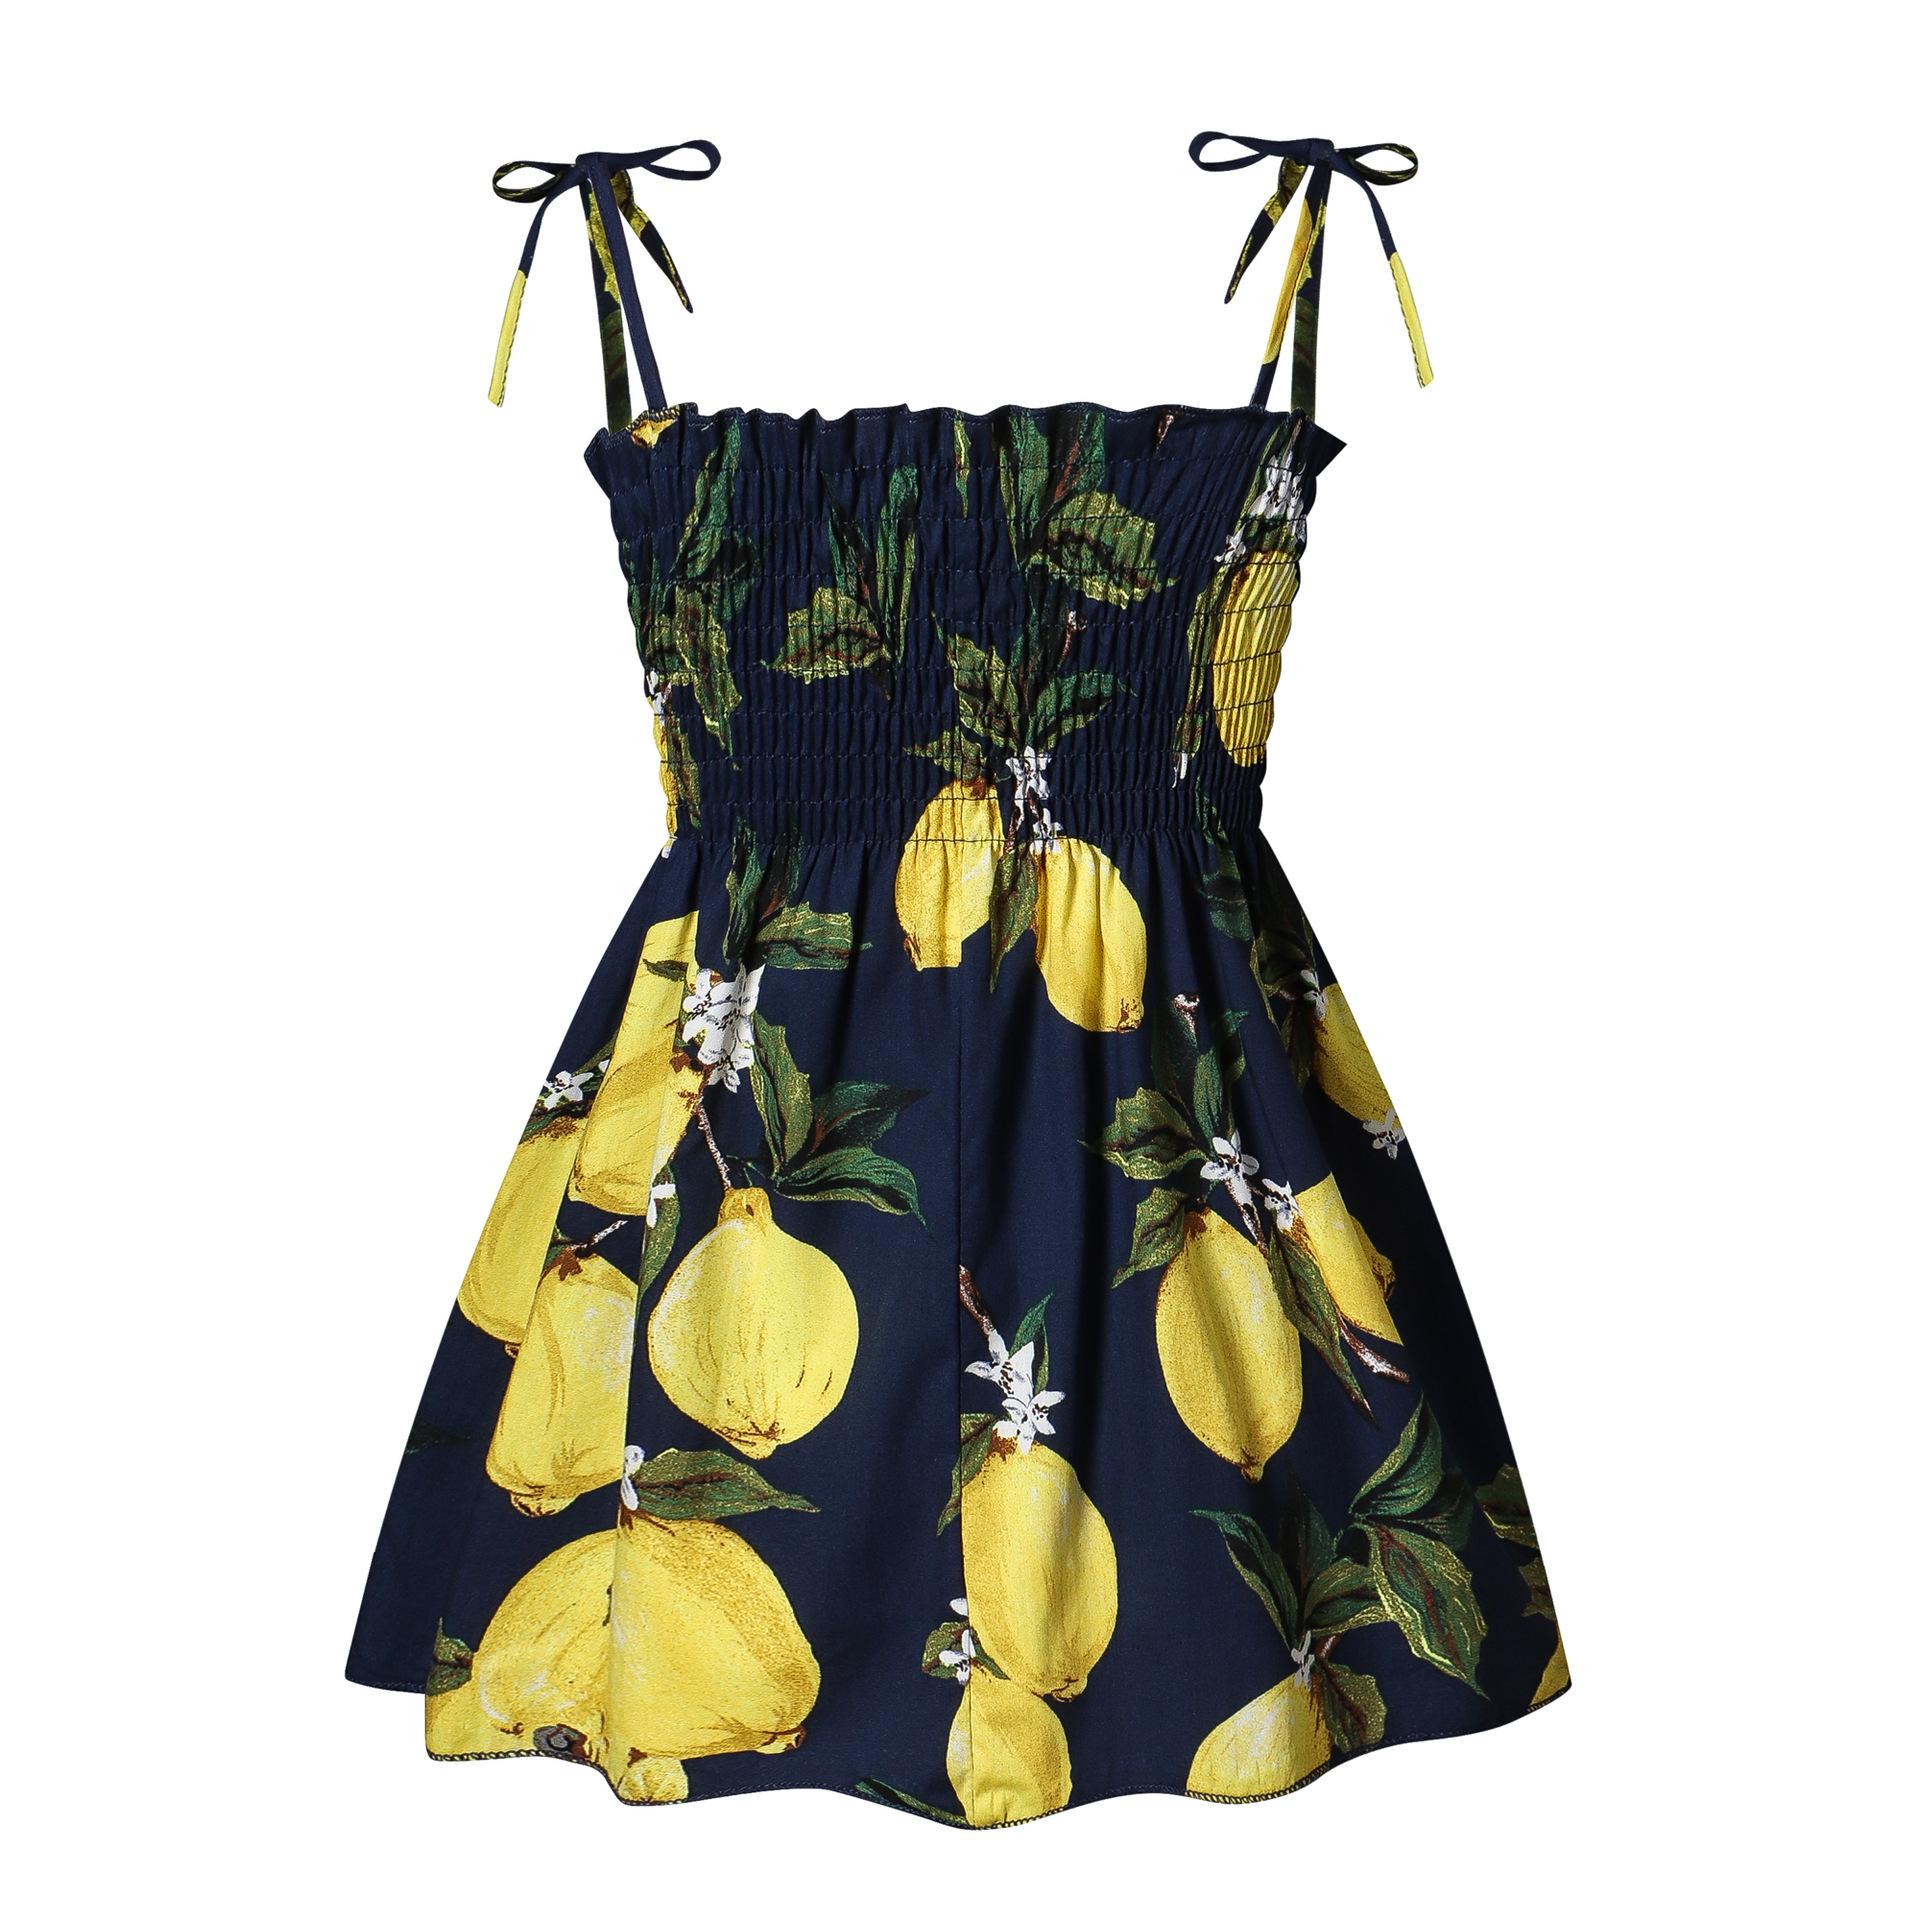 YINGLONG 2020 summer new beach children's princess dress girl's pure color lovely hemp SLING DRESS